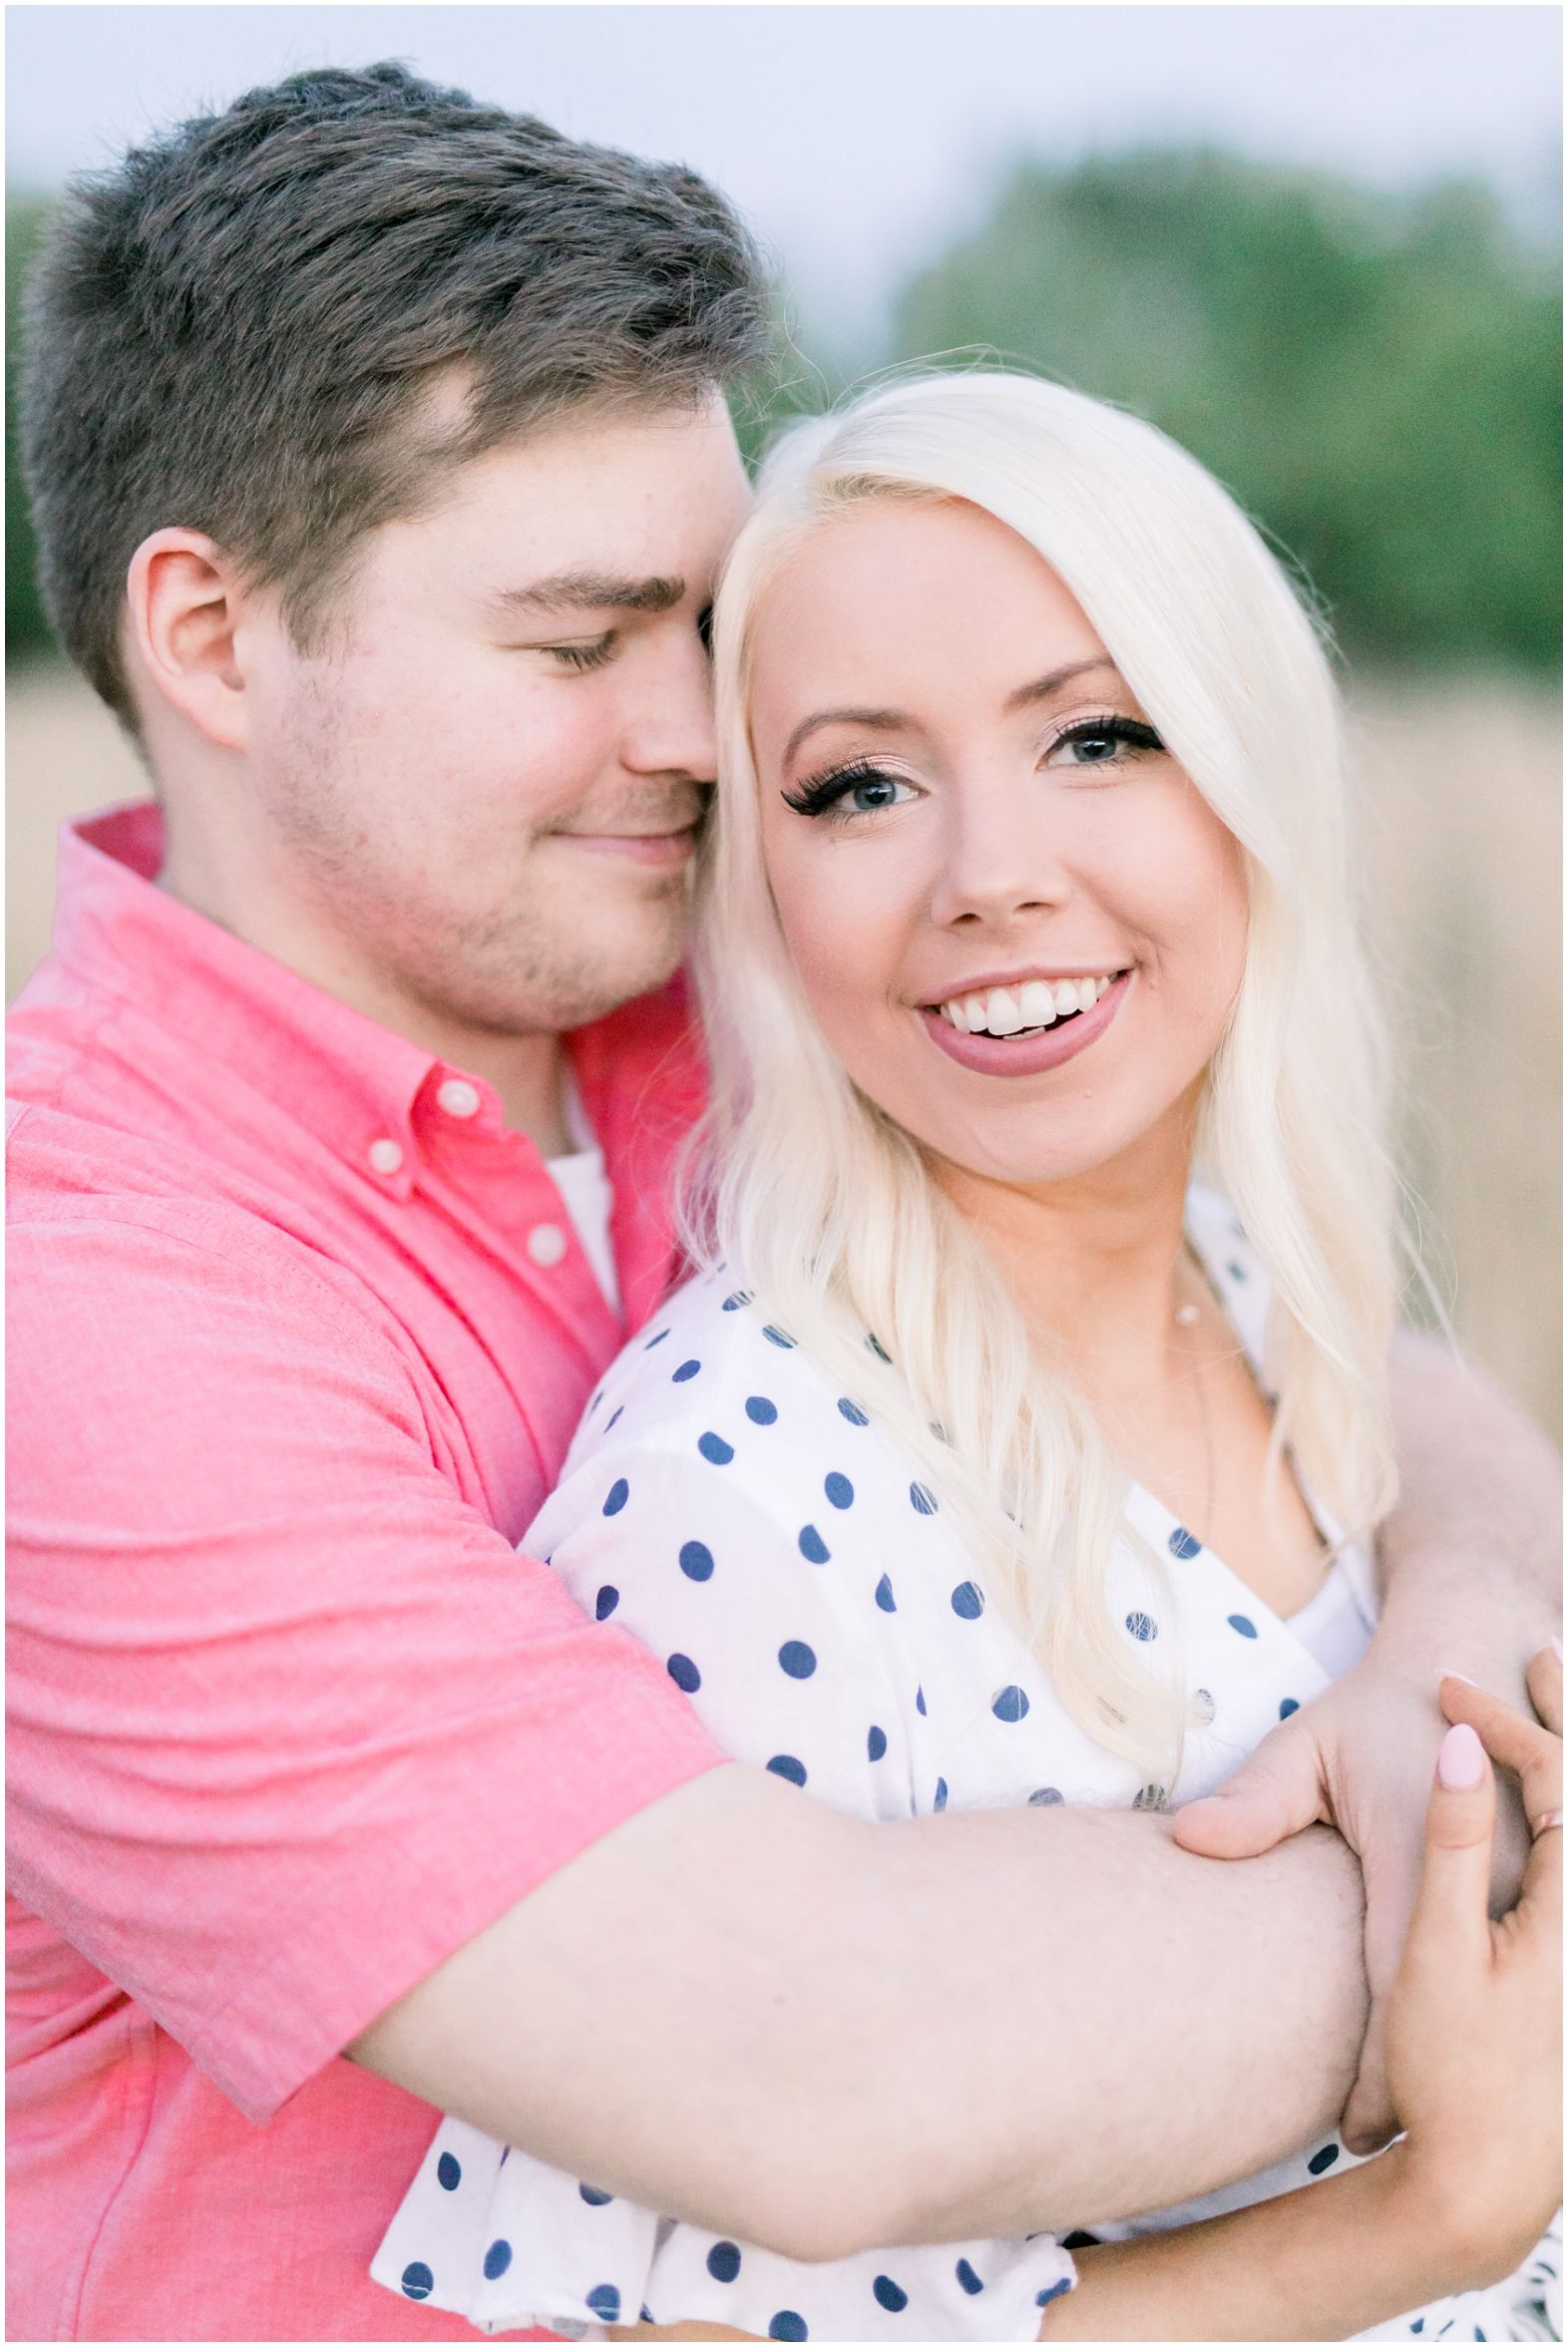 Dating Fayetteville AR im 25 en dating een 18-jarige